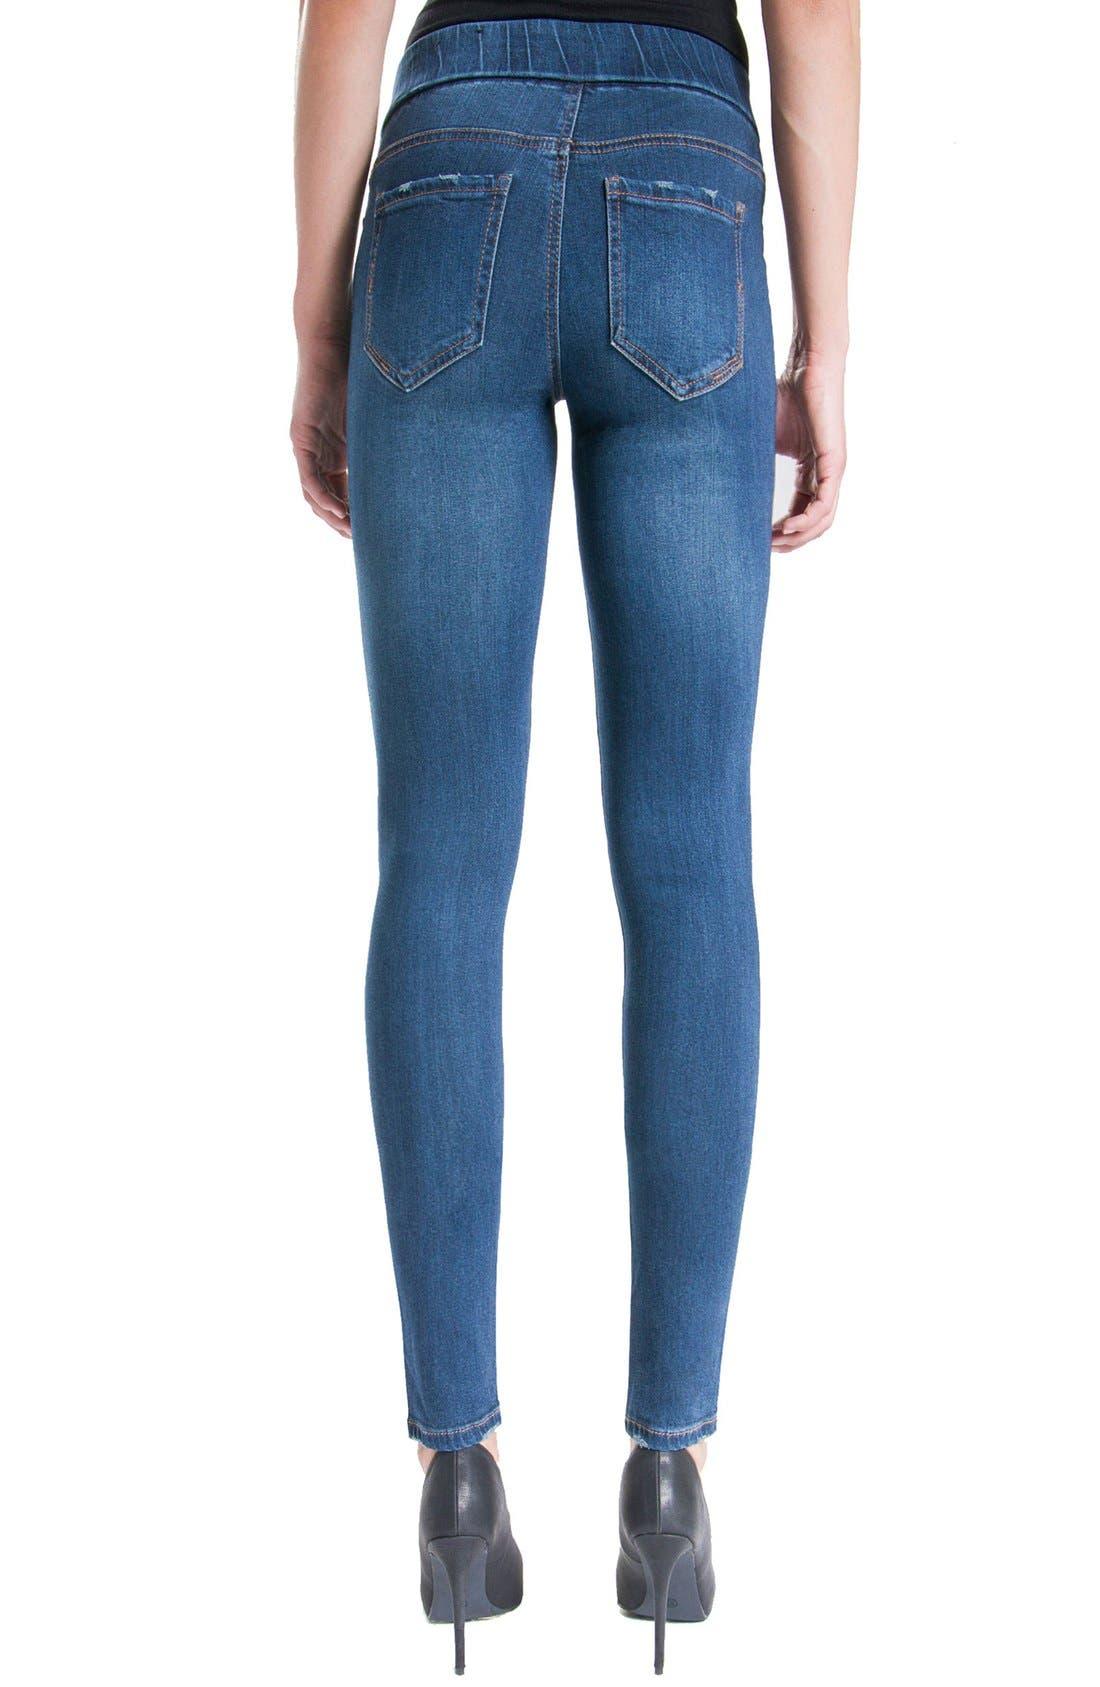 Jeans Company Sienna Mid Rise Soft Stretch Denim Leggings,                             Alternate thumbnail 18, color,